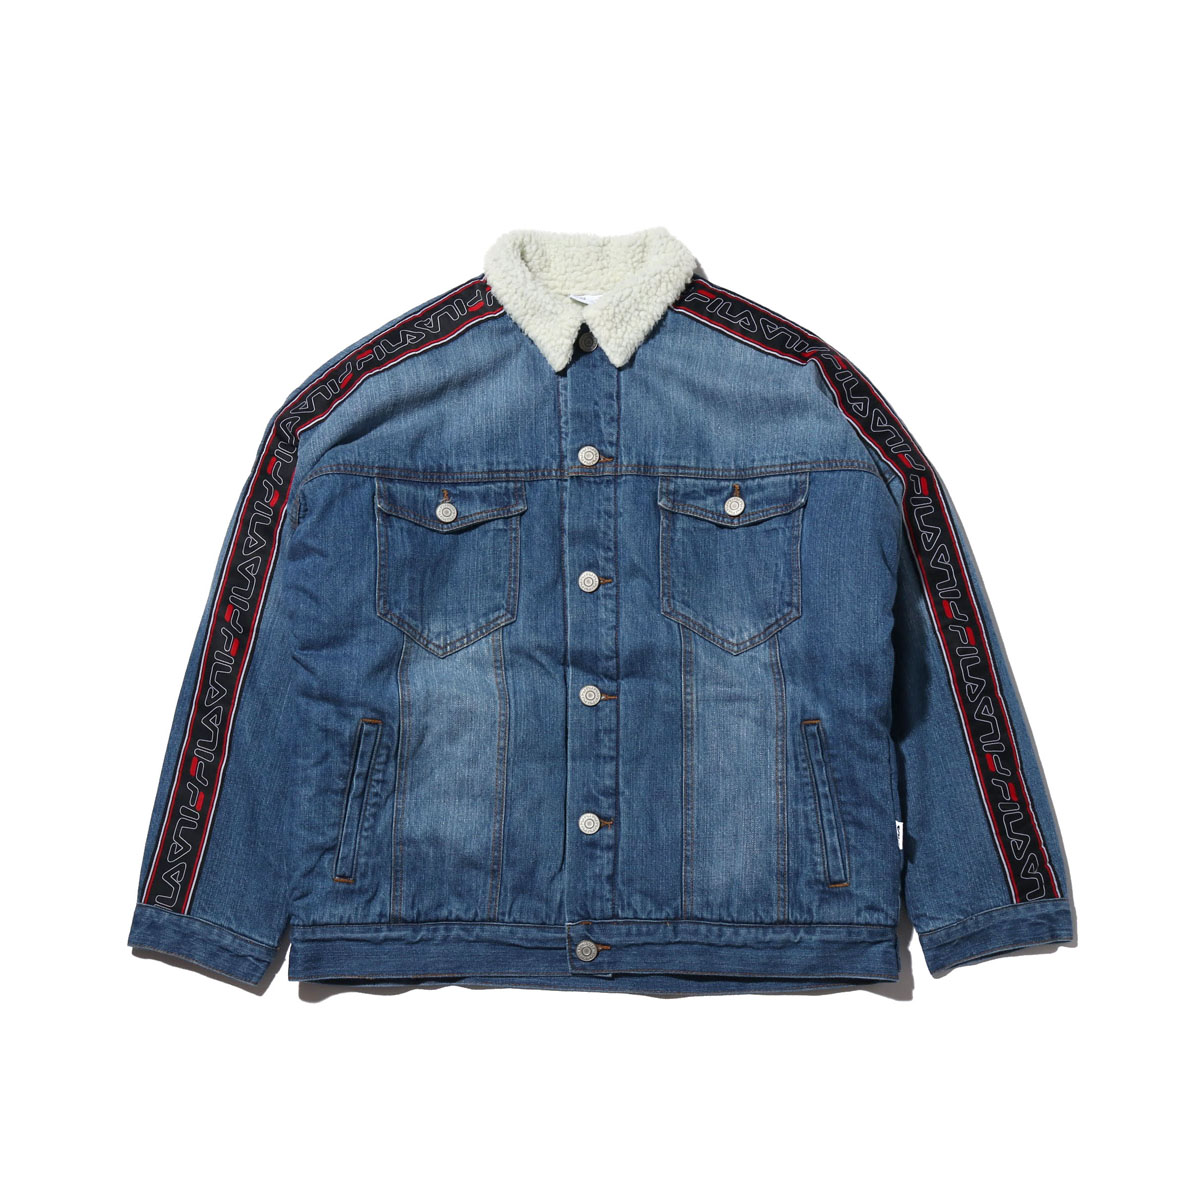 FILA Denim boa Jacket(NAVY)(フィラ デニム ボア ジャケット)【メンズ】【ジャケット】【18FW-I】